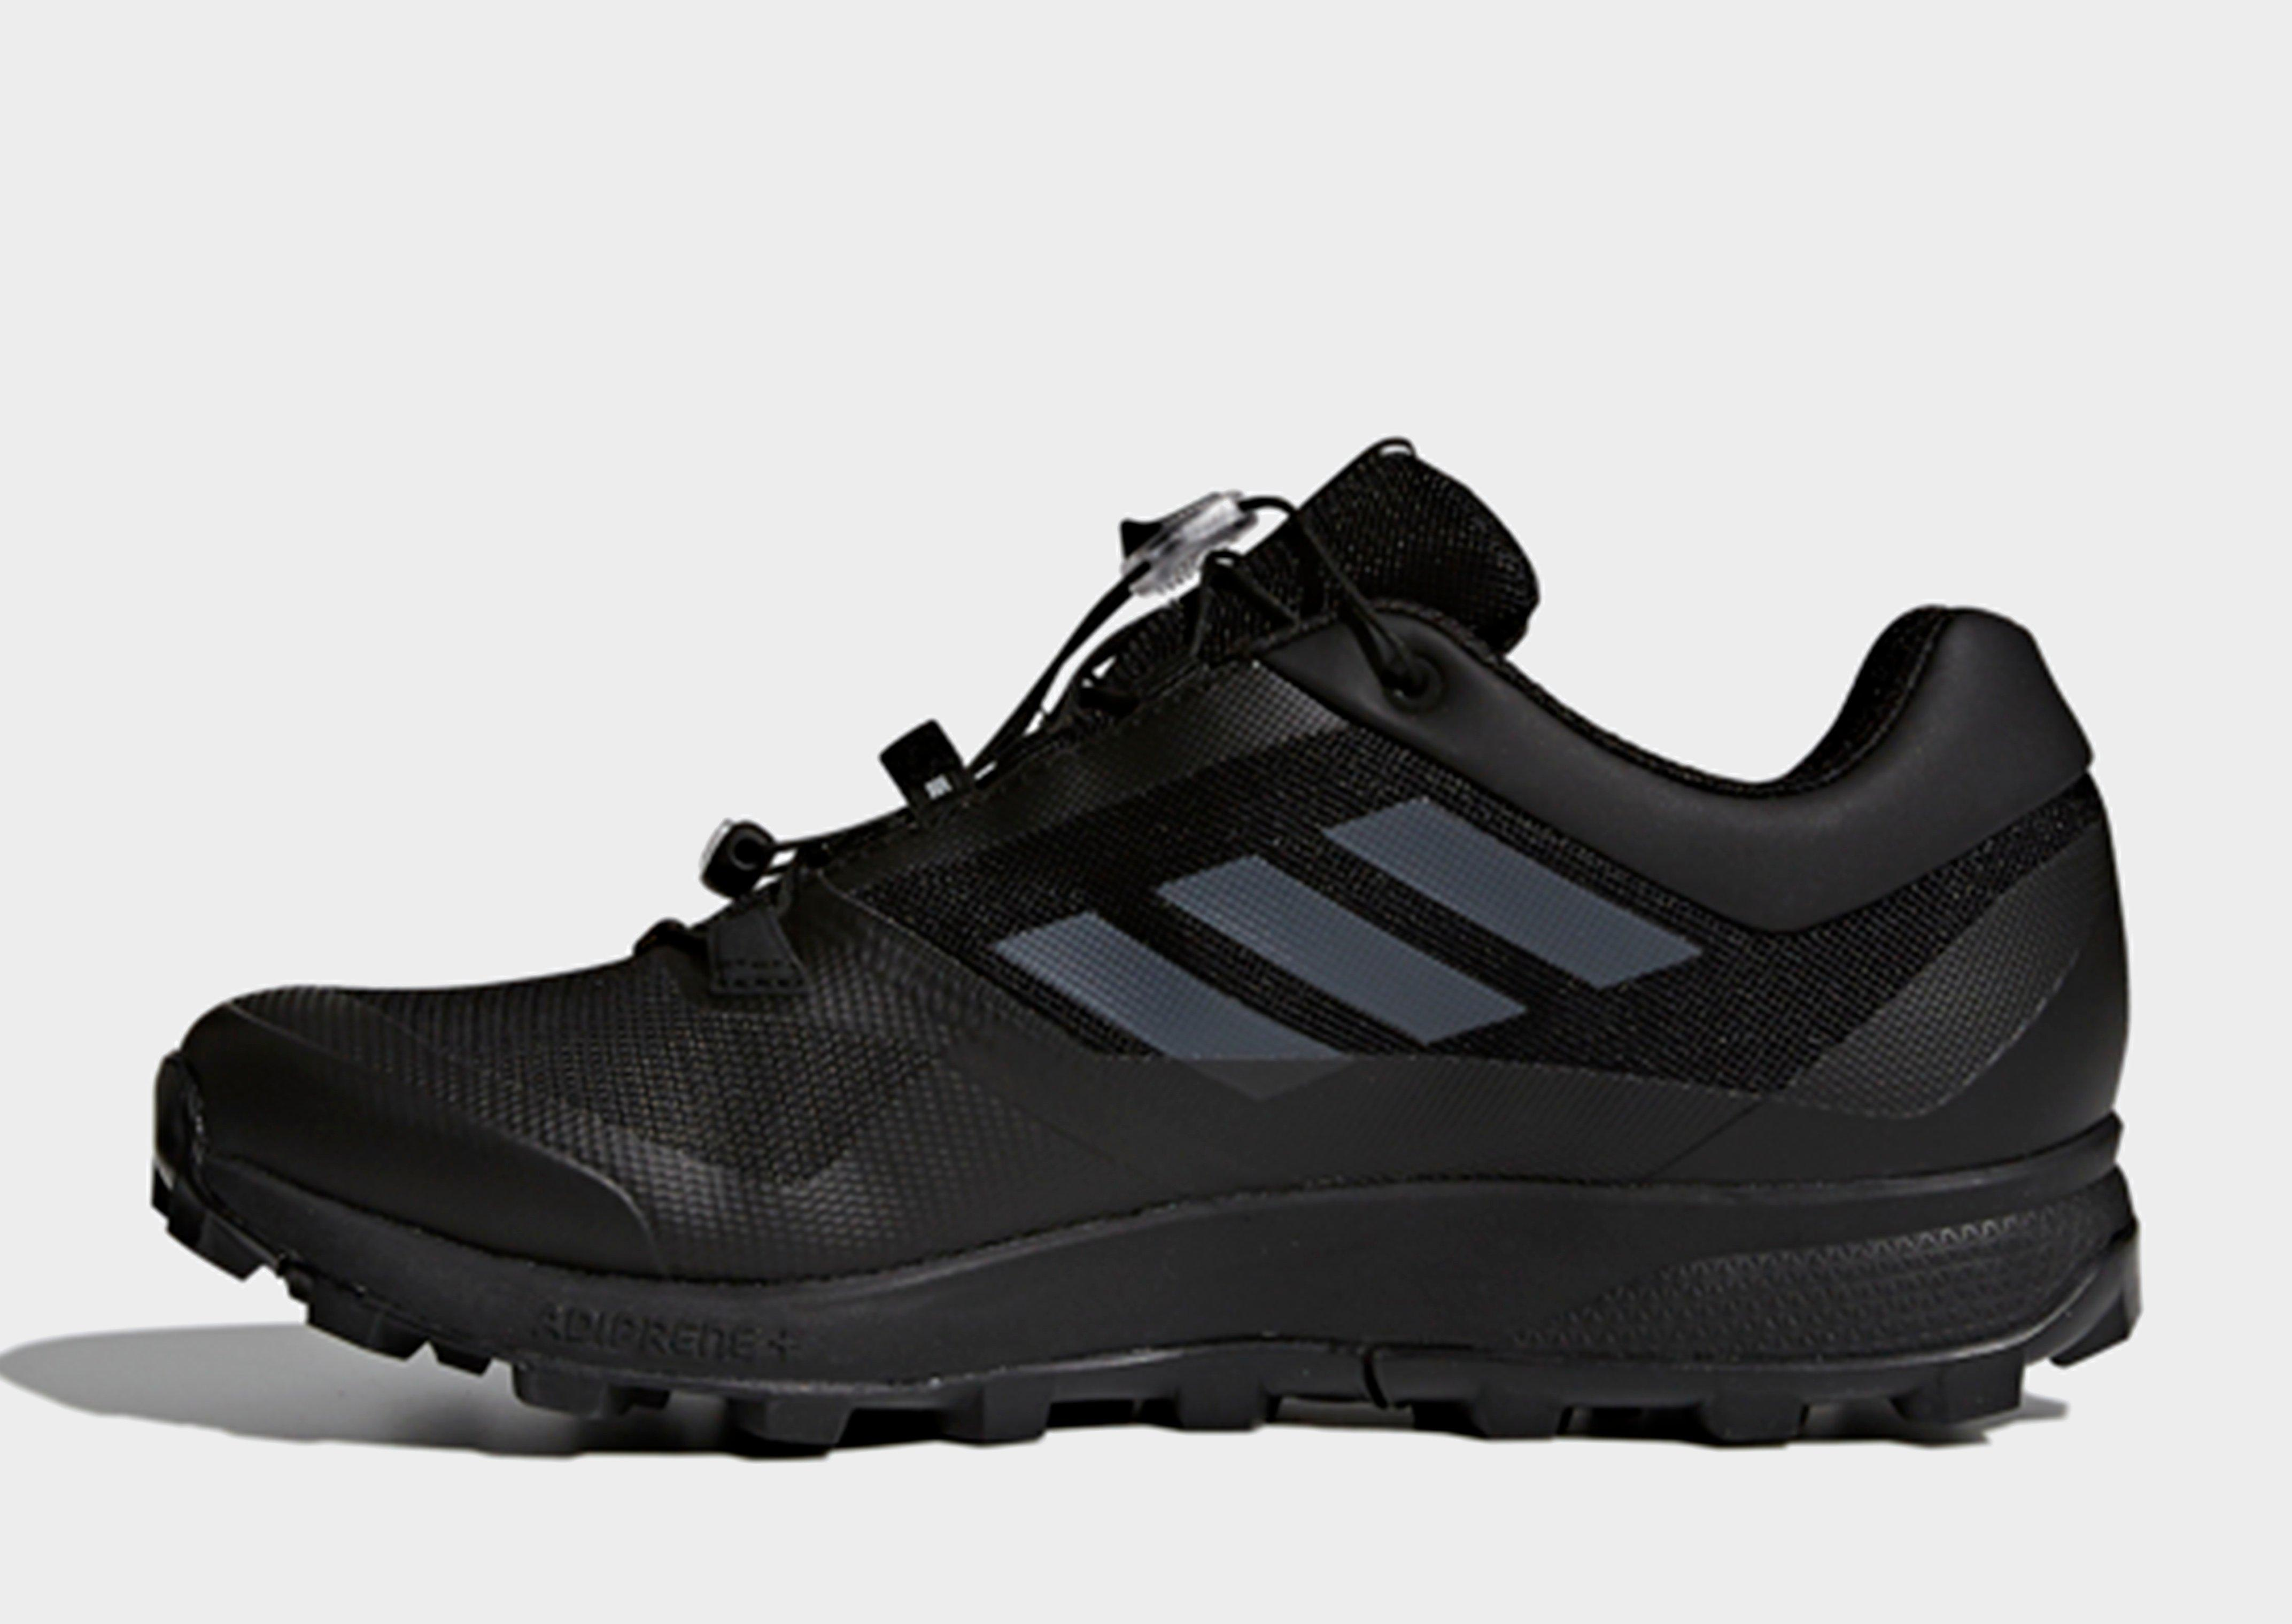 9c730b6de05 adidas Terrex Trailmaker Gtx Shoes in Black for Men - Lyst